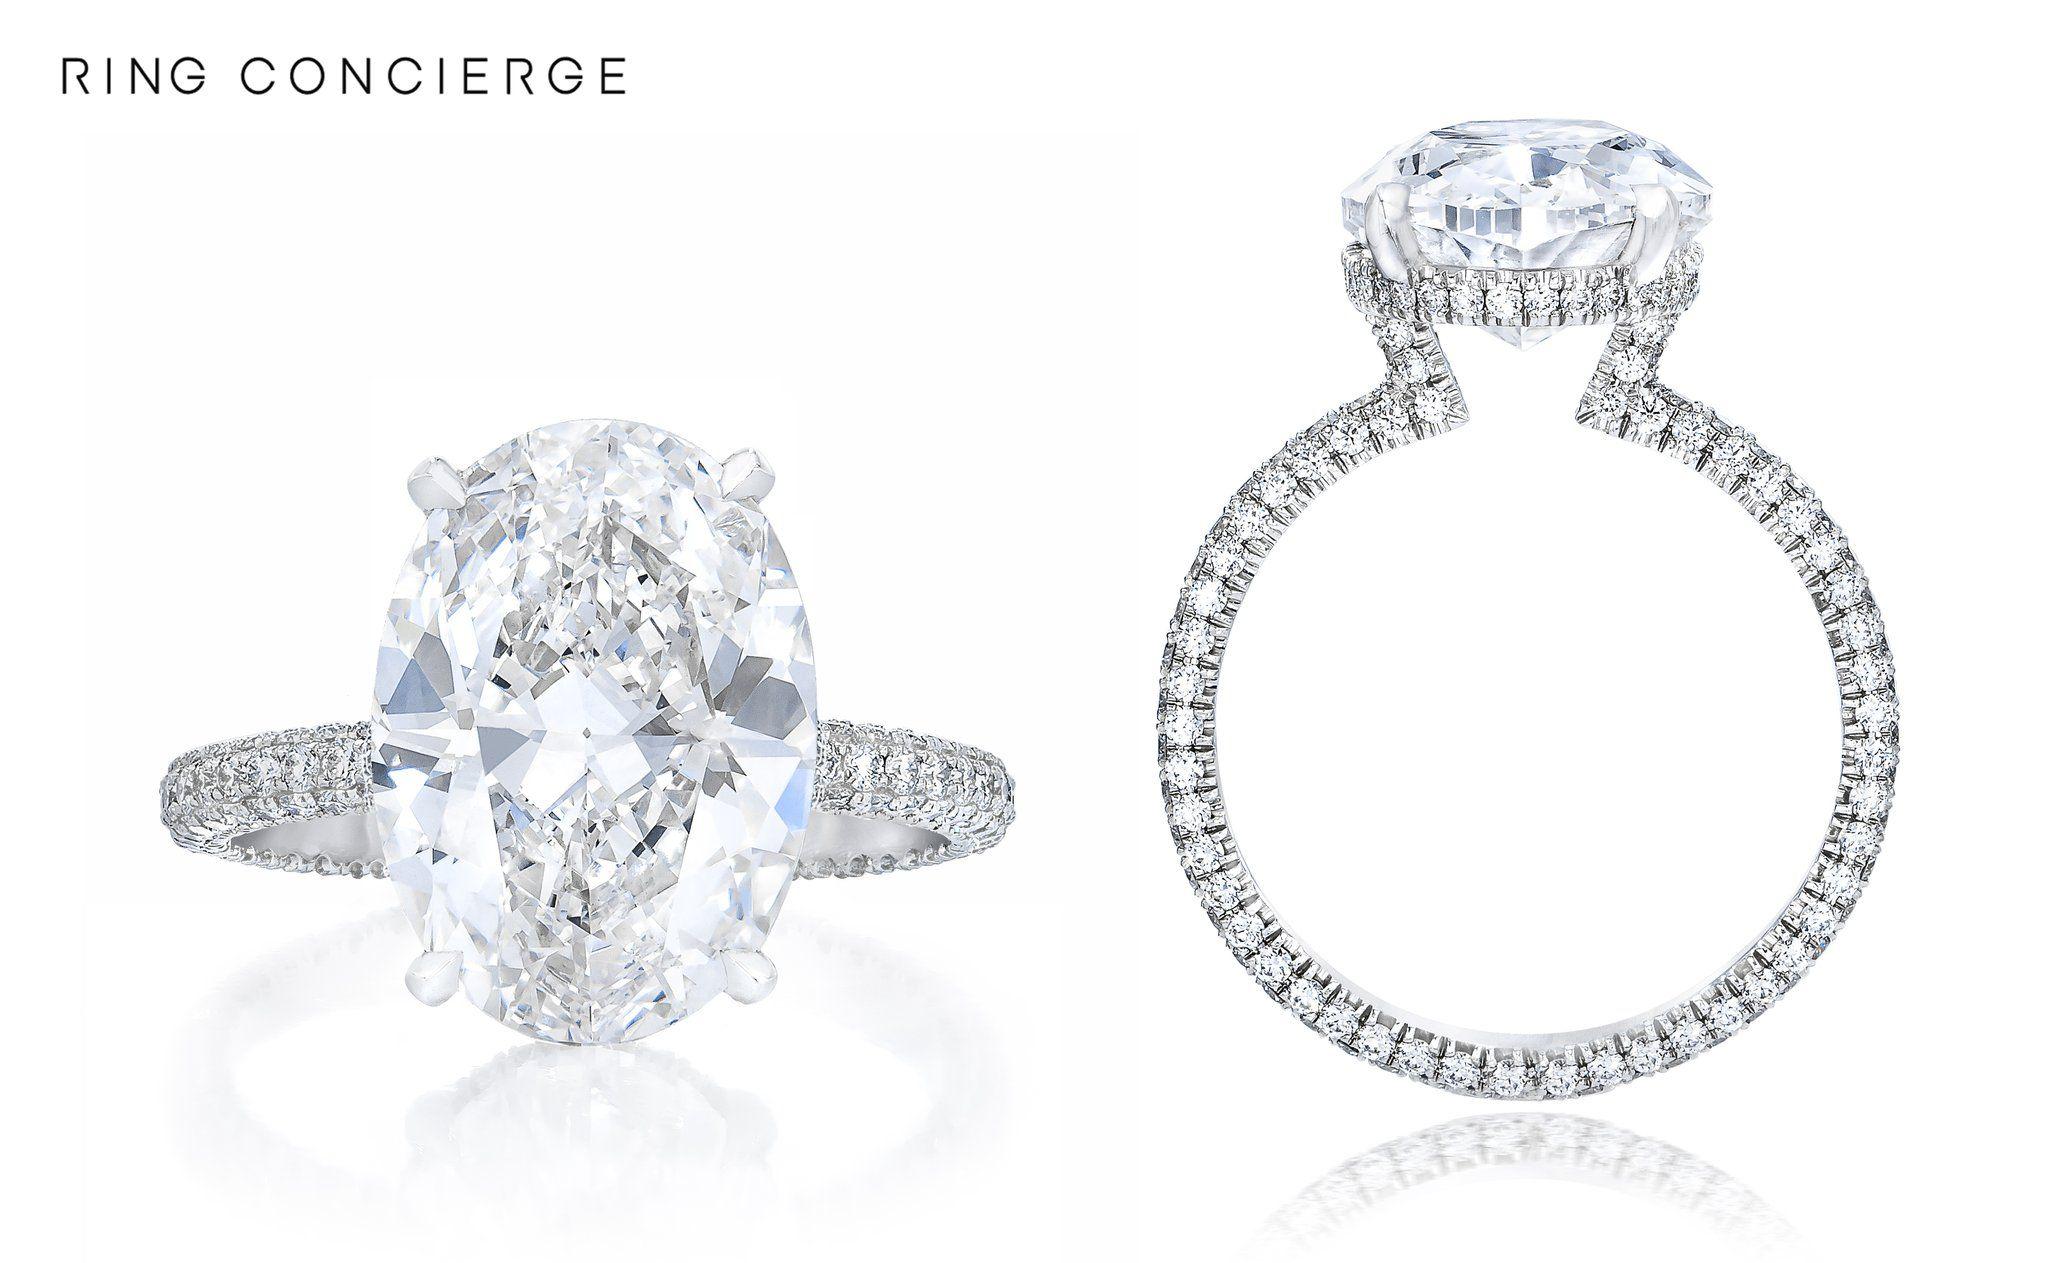 Devon Windsor S Diamond Engagement Ring Took 1 Month To